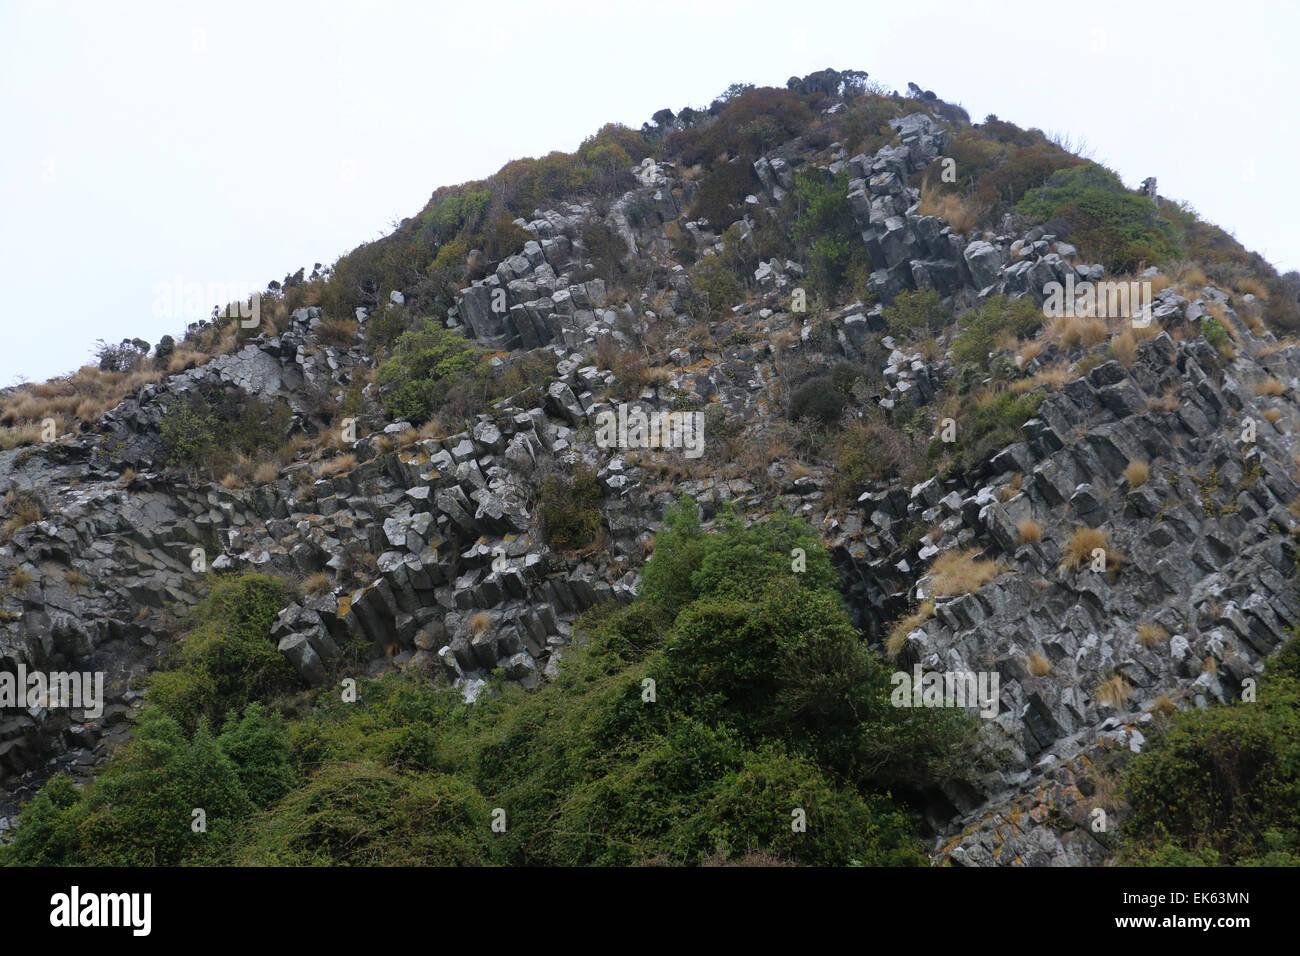 columnar basalt The Pyramids Lava rock formations Otago Peninsula Dunedin South Island New Zealand - Stock Image